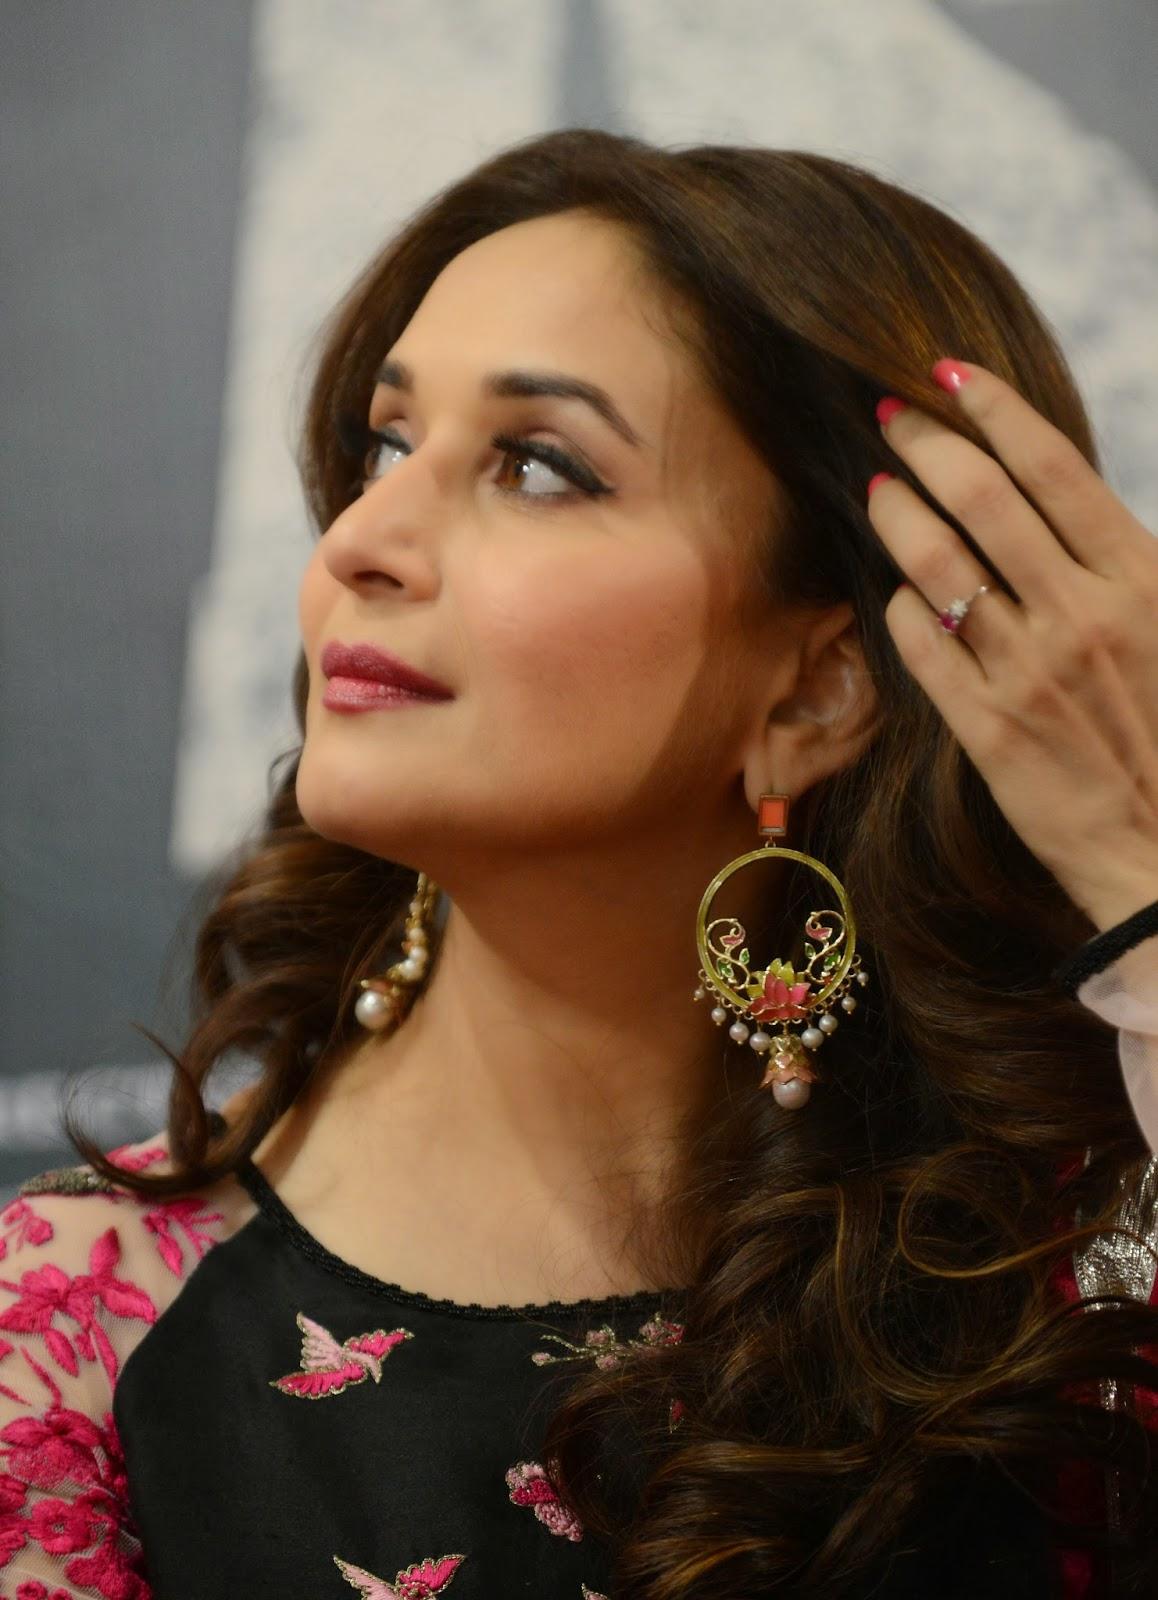 Ahmedabad, India, Bollywood, Showbiz, Movie, Film, Dedh Ishqiya, Madhuri Dixit Nene, Forthcoming, Promotion, Actress,